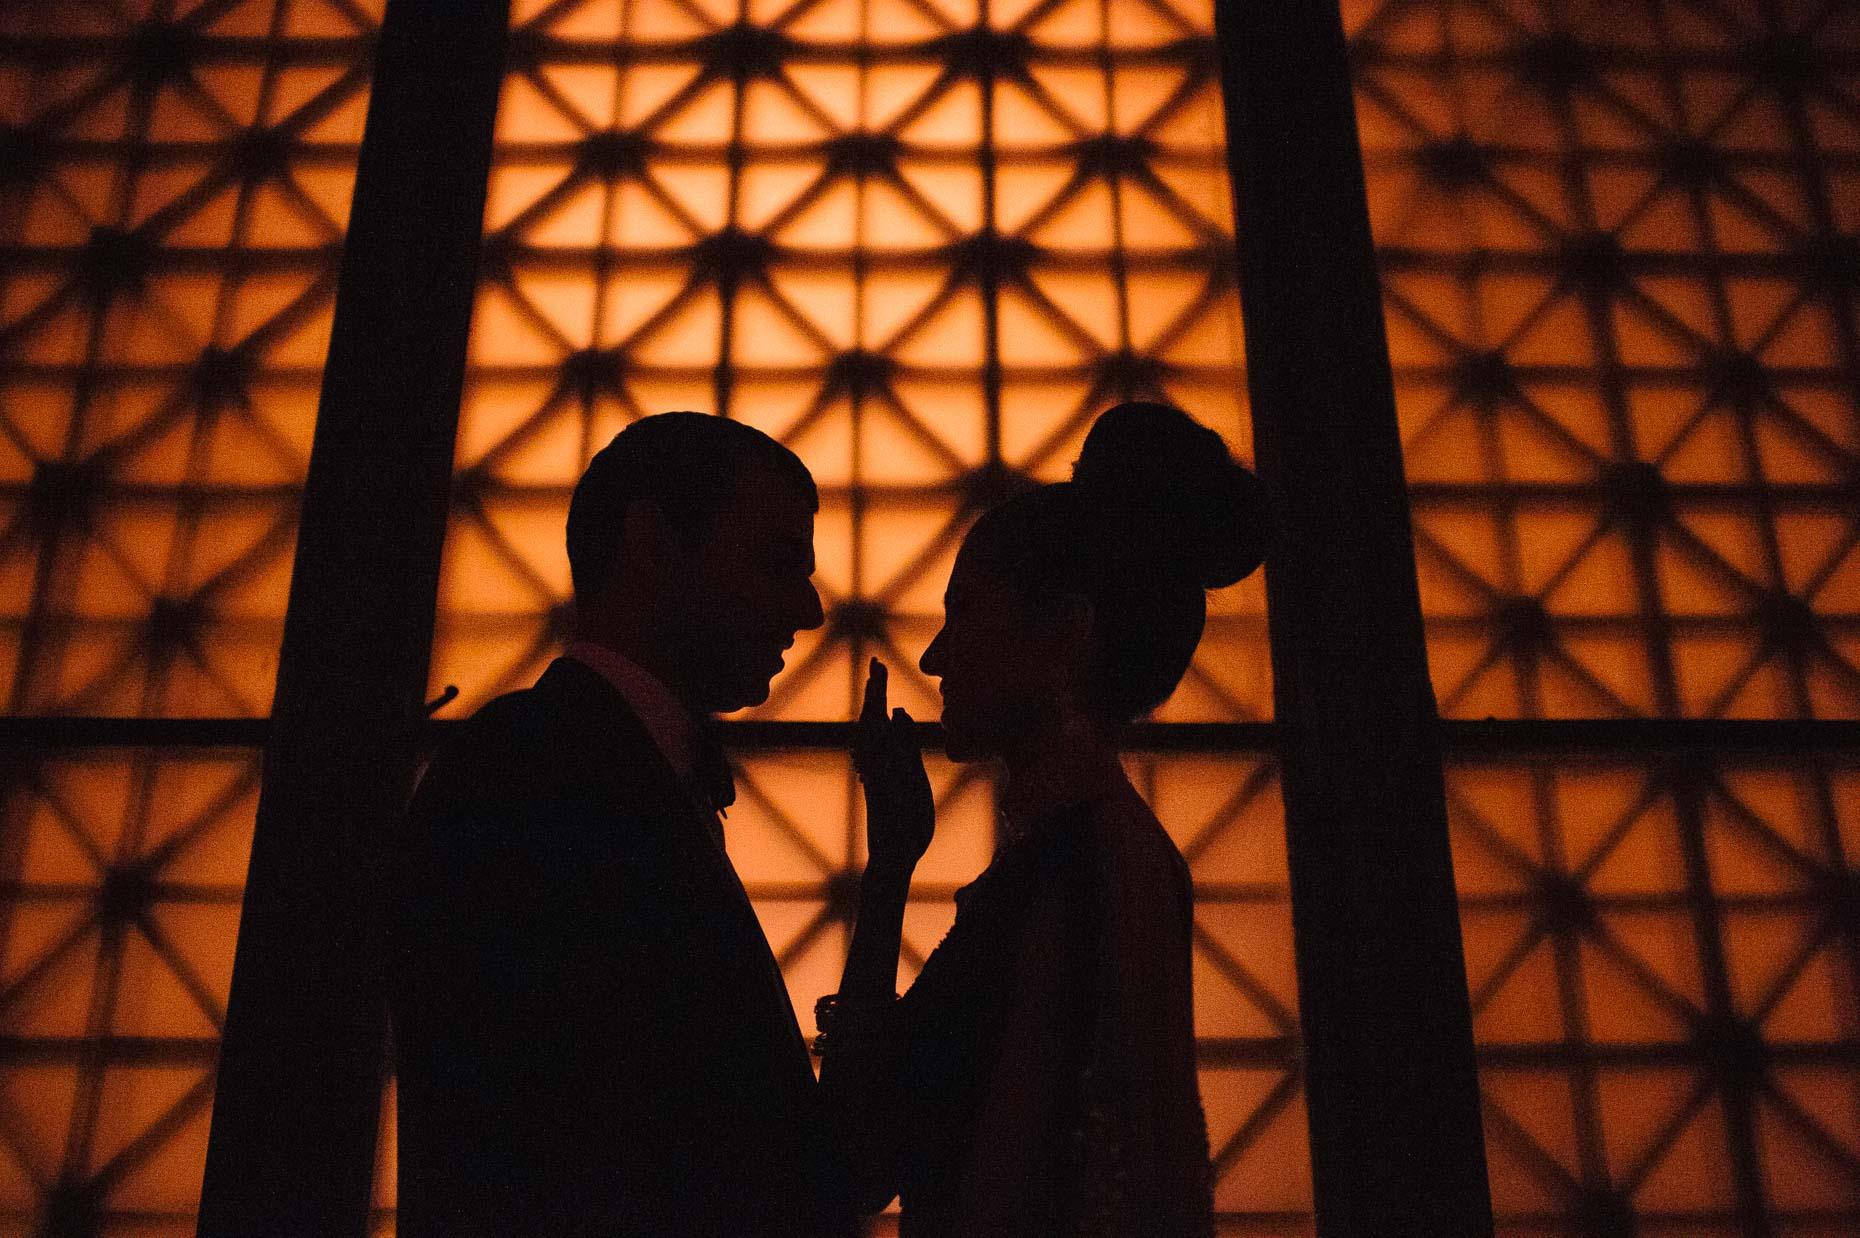 Weddings by Elliott O'Donovan - Washington DC_-3.jpg